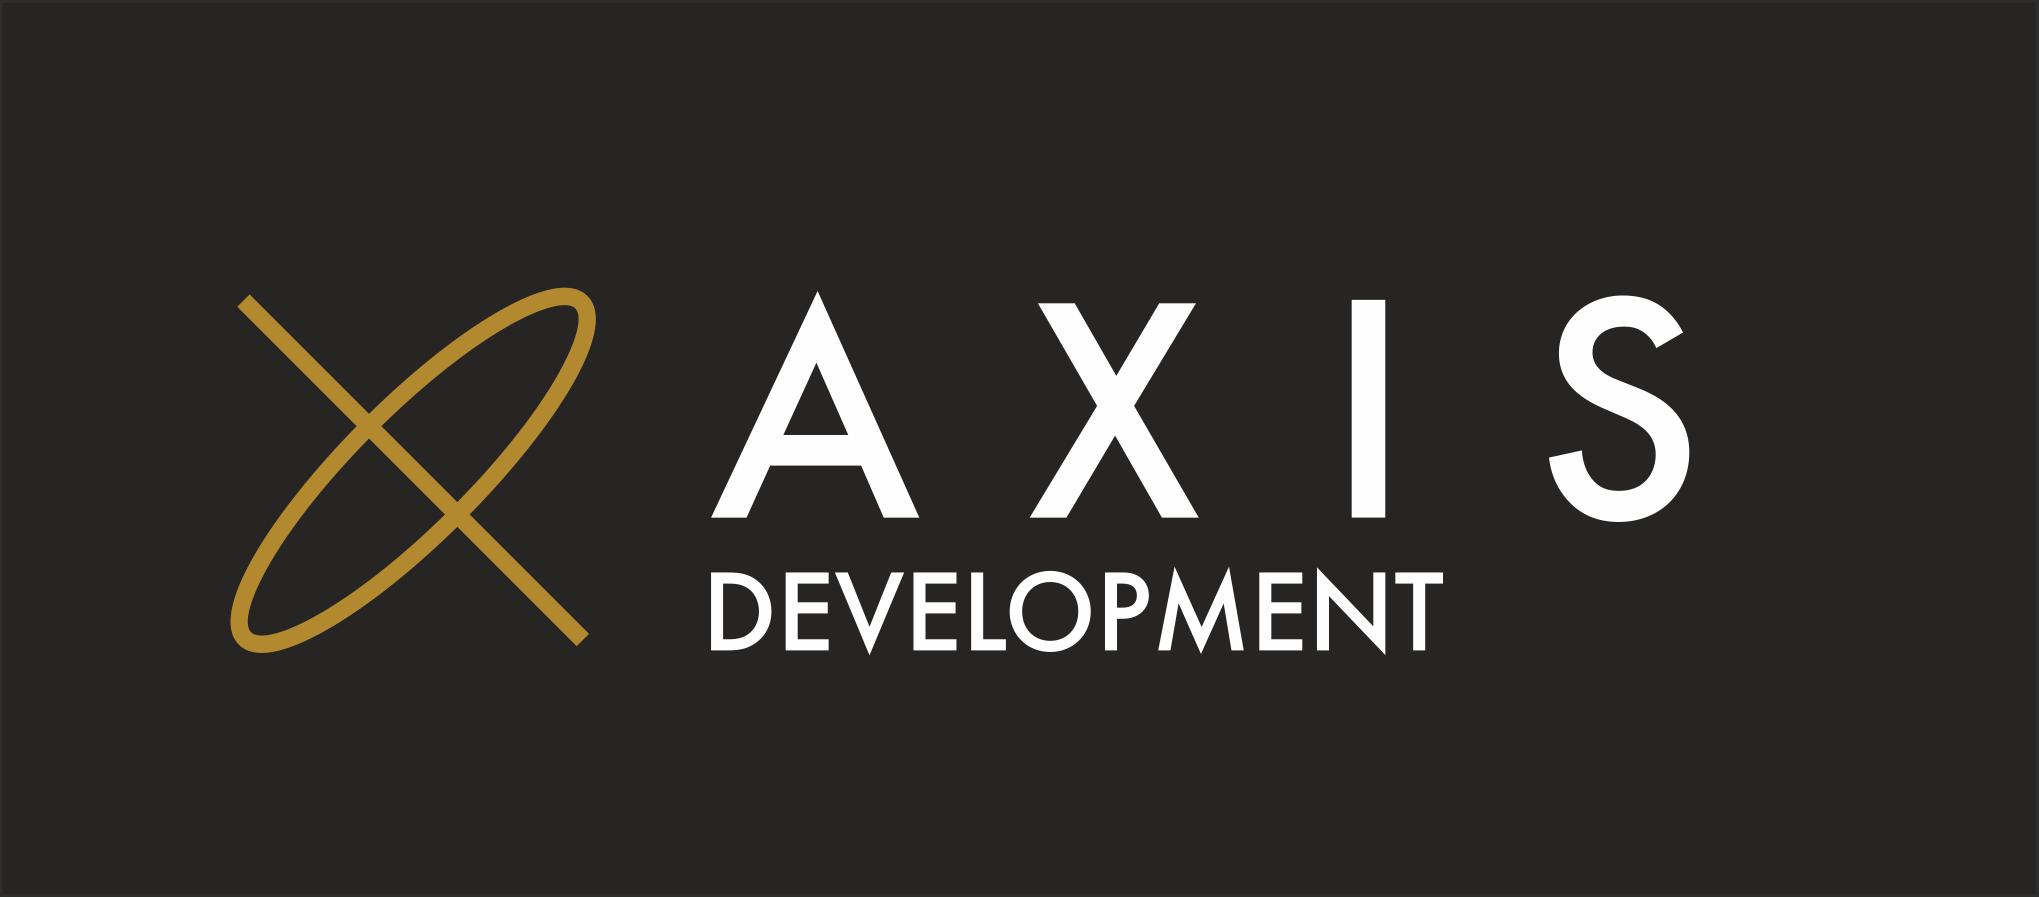 Группа компаний AXIS